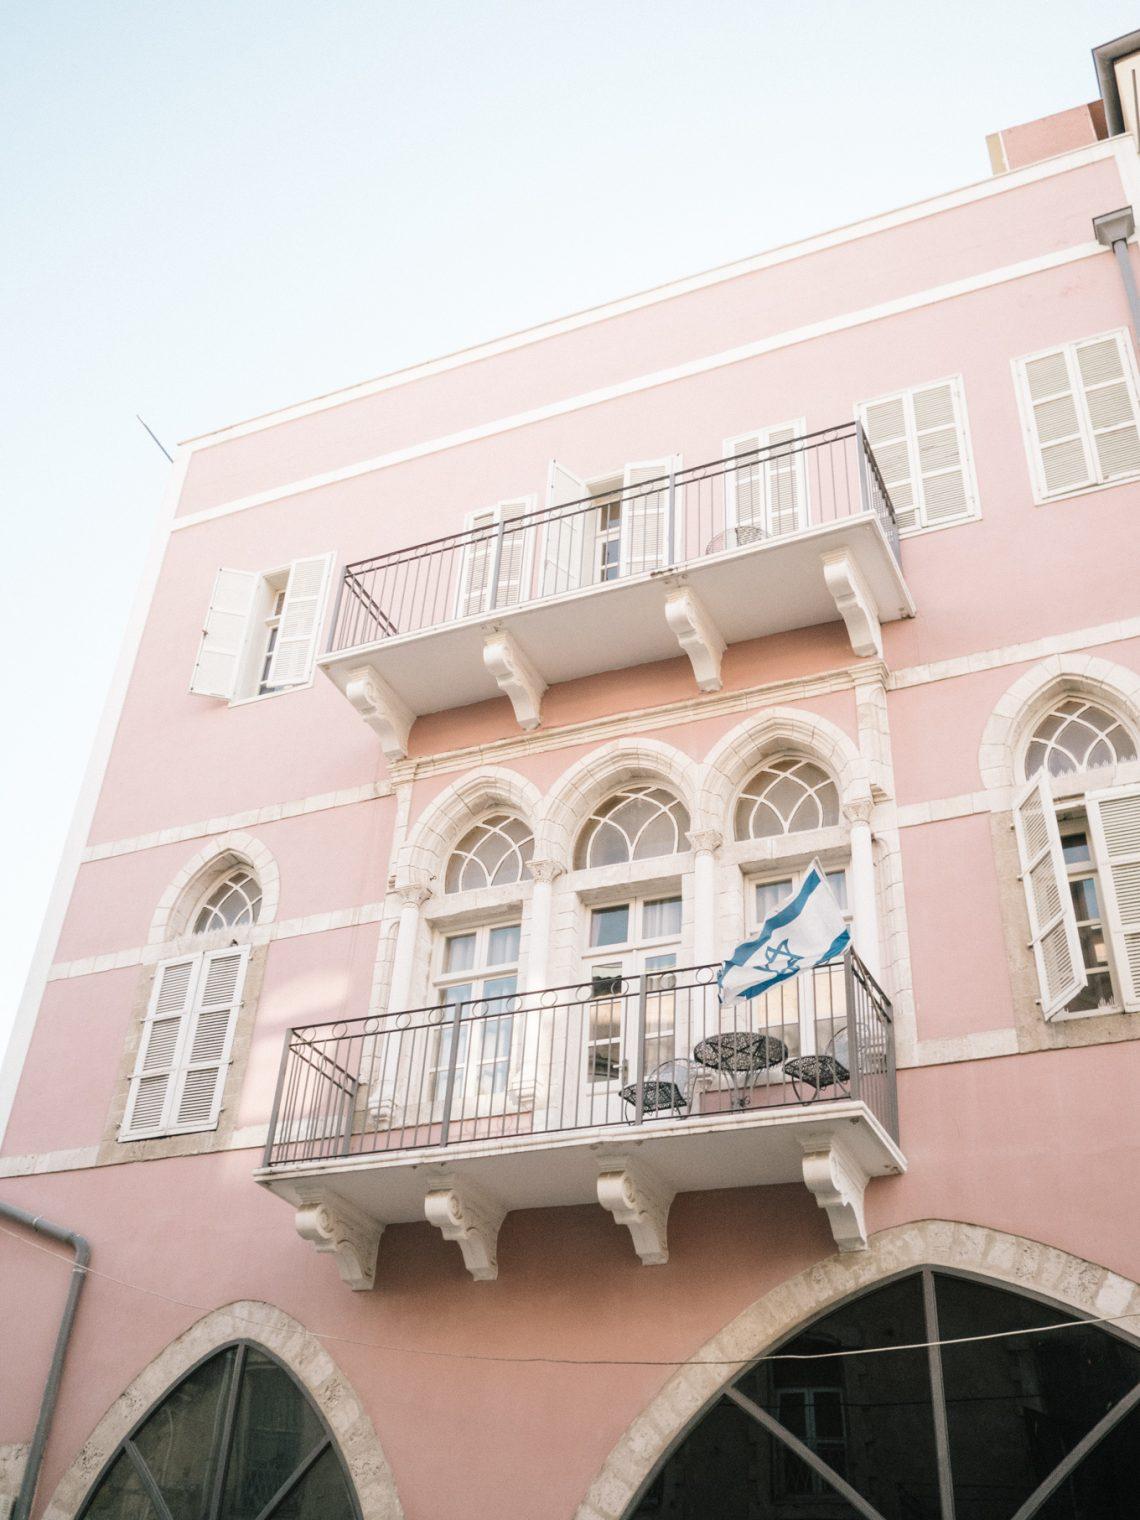 5 Things To Do In Jaffa, Tel Aviv